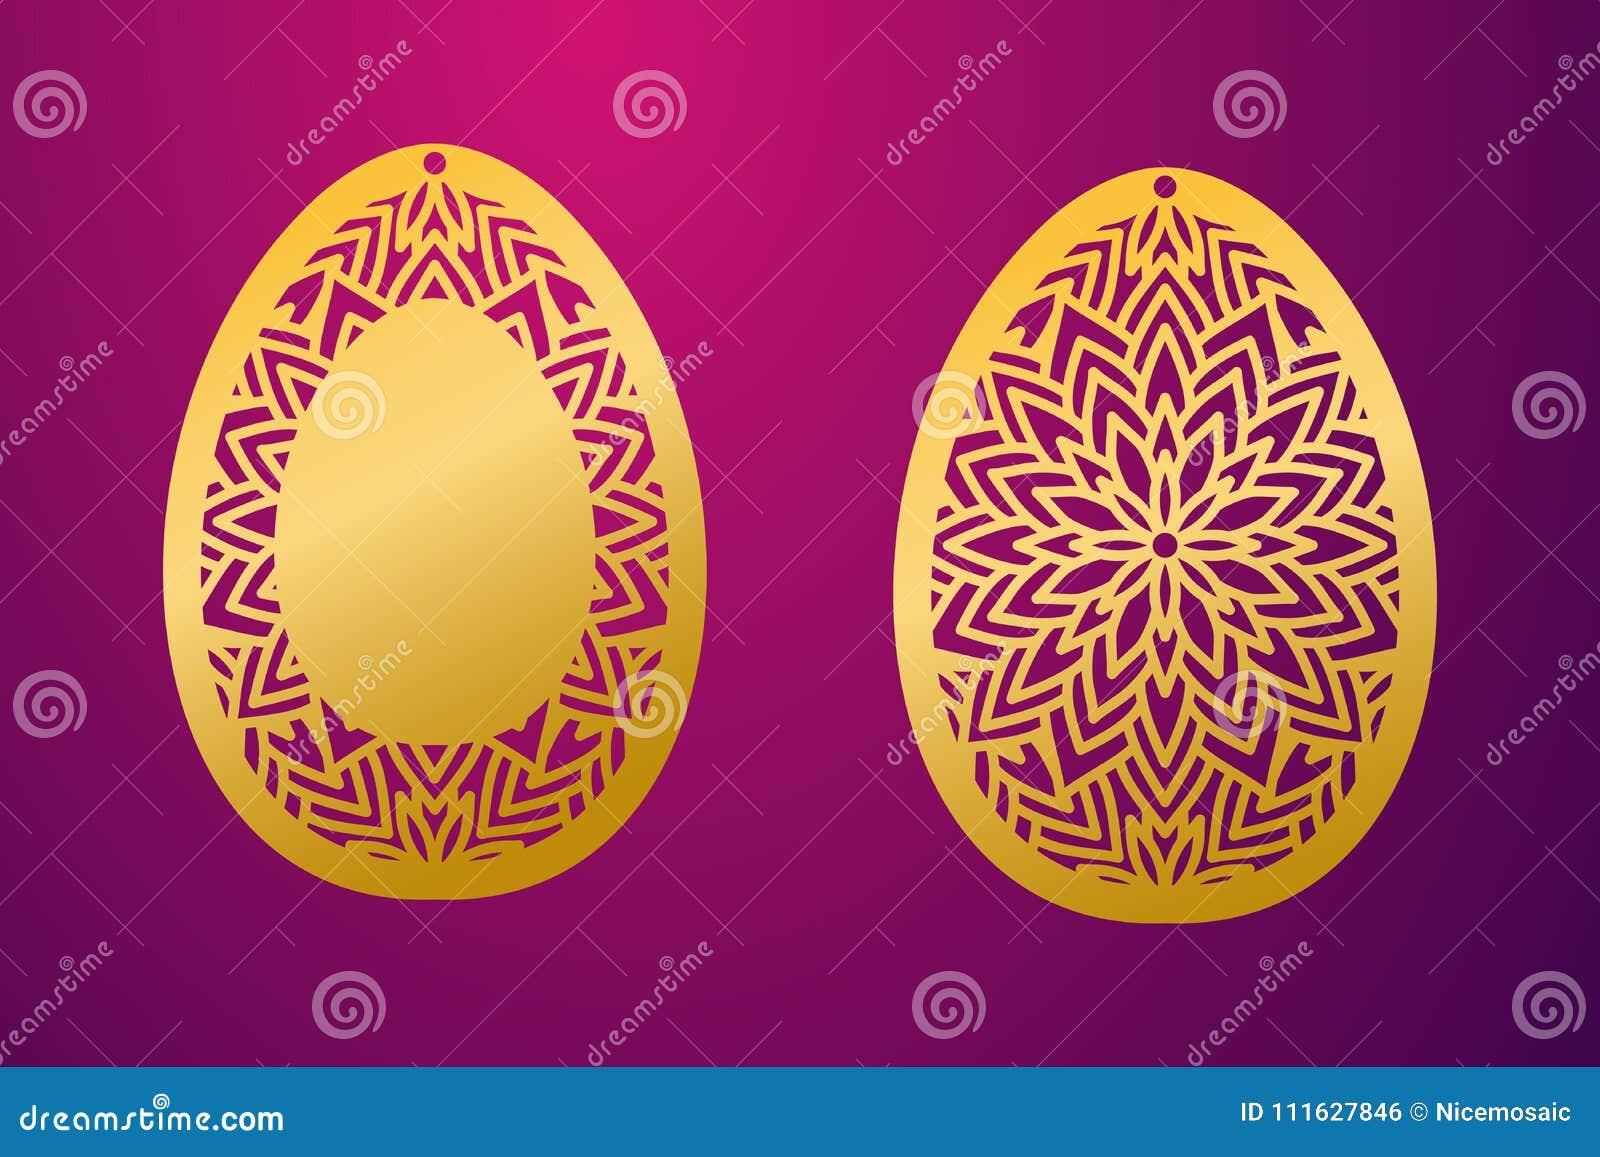 Laser Cut Happy Easter Egg Vector Stencil Ornamental Easter